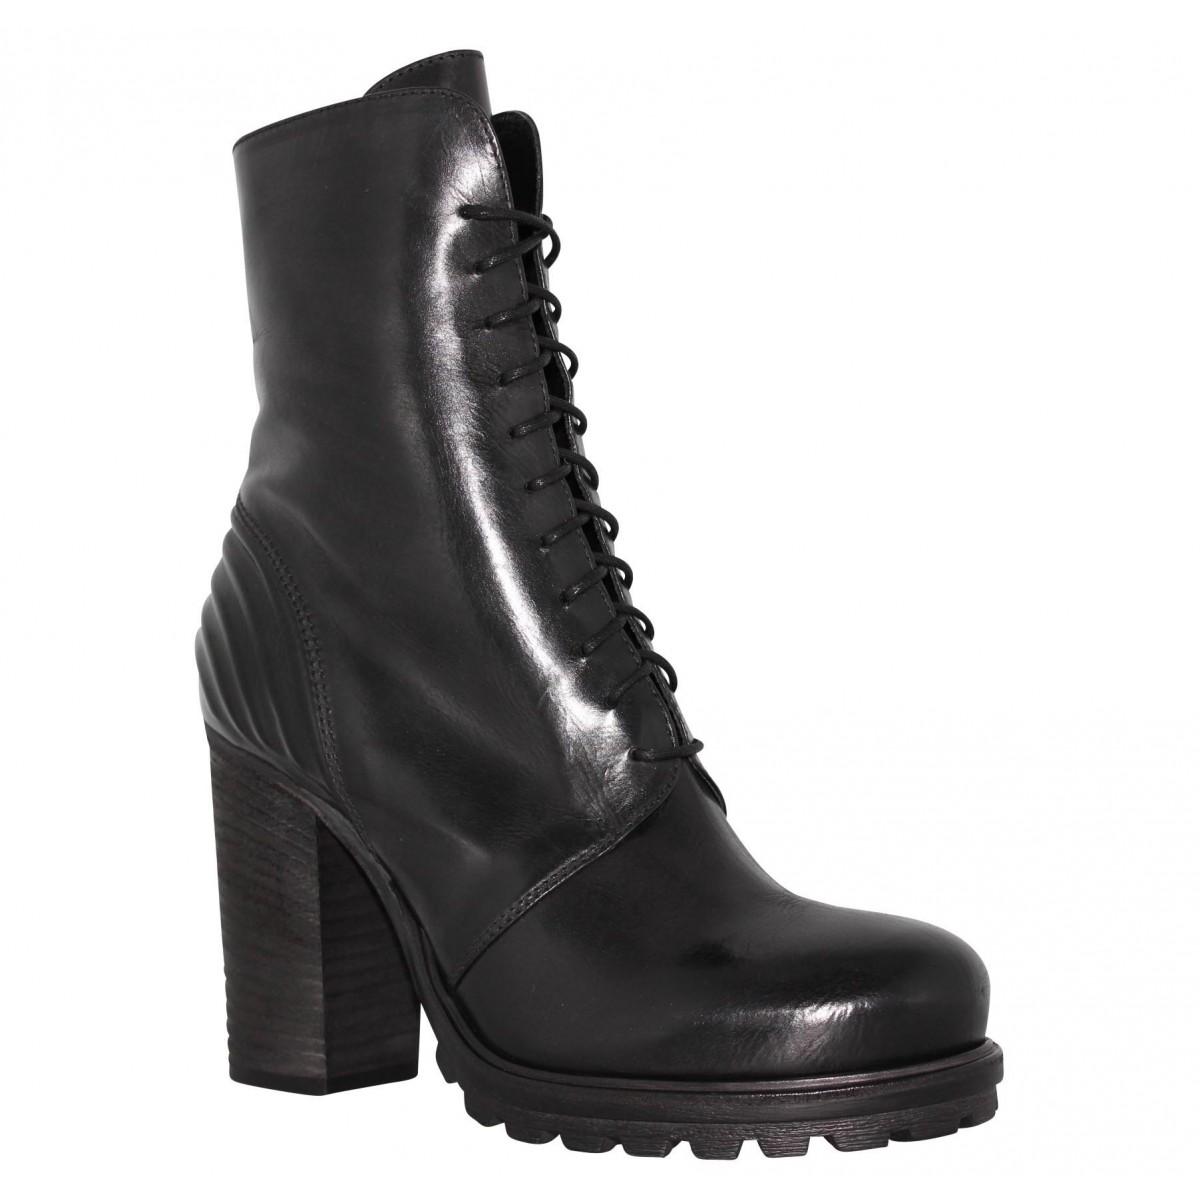 Bottines VIC 8516 cuir Femme Noir